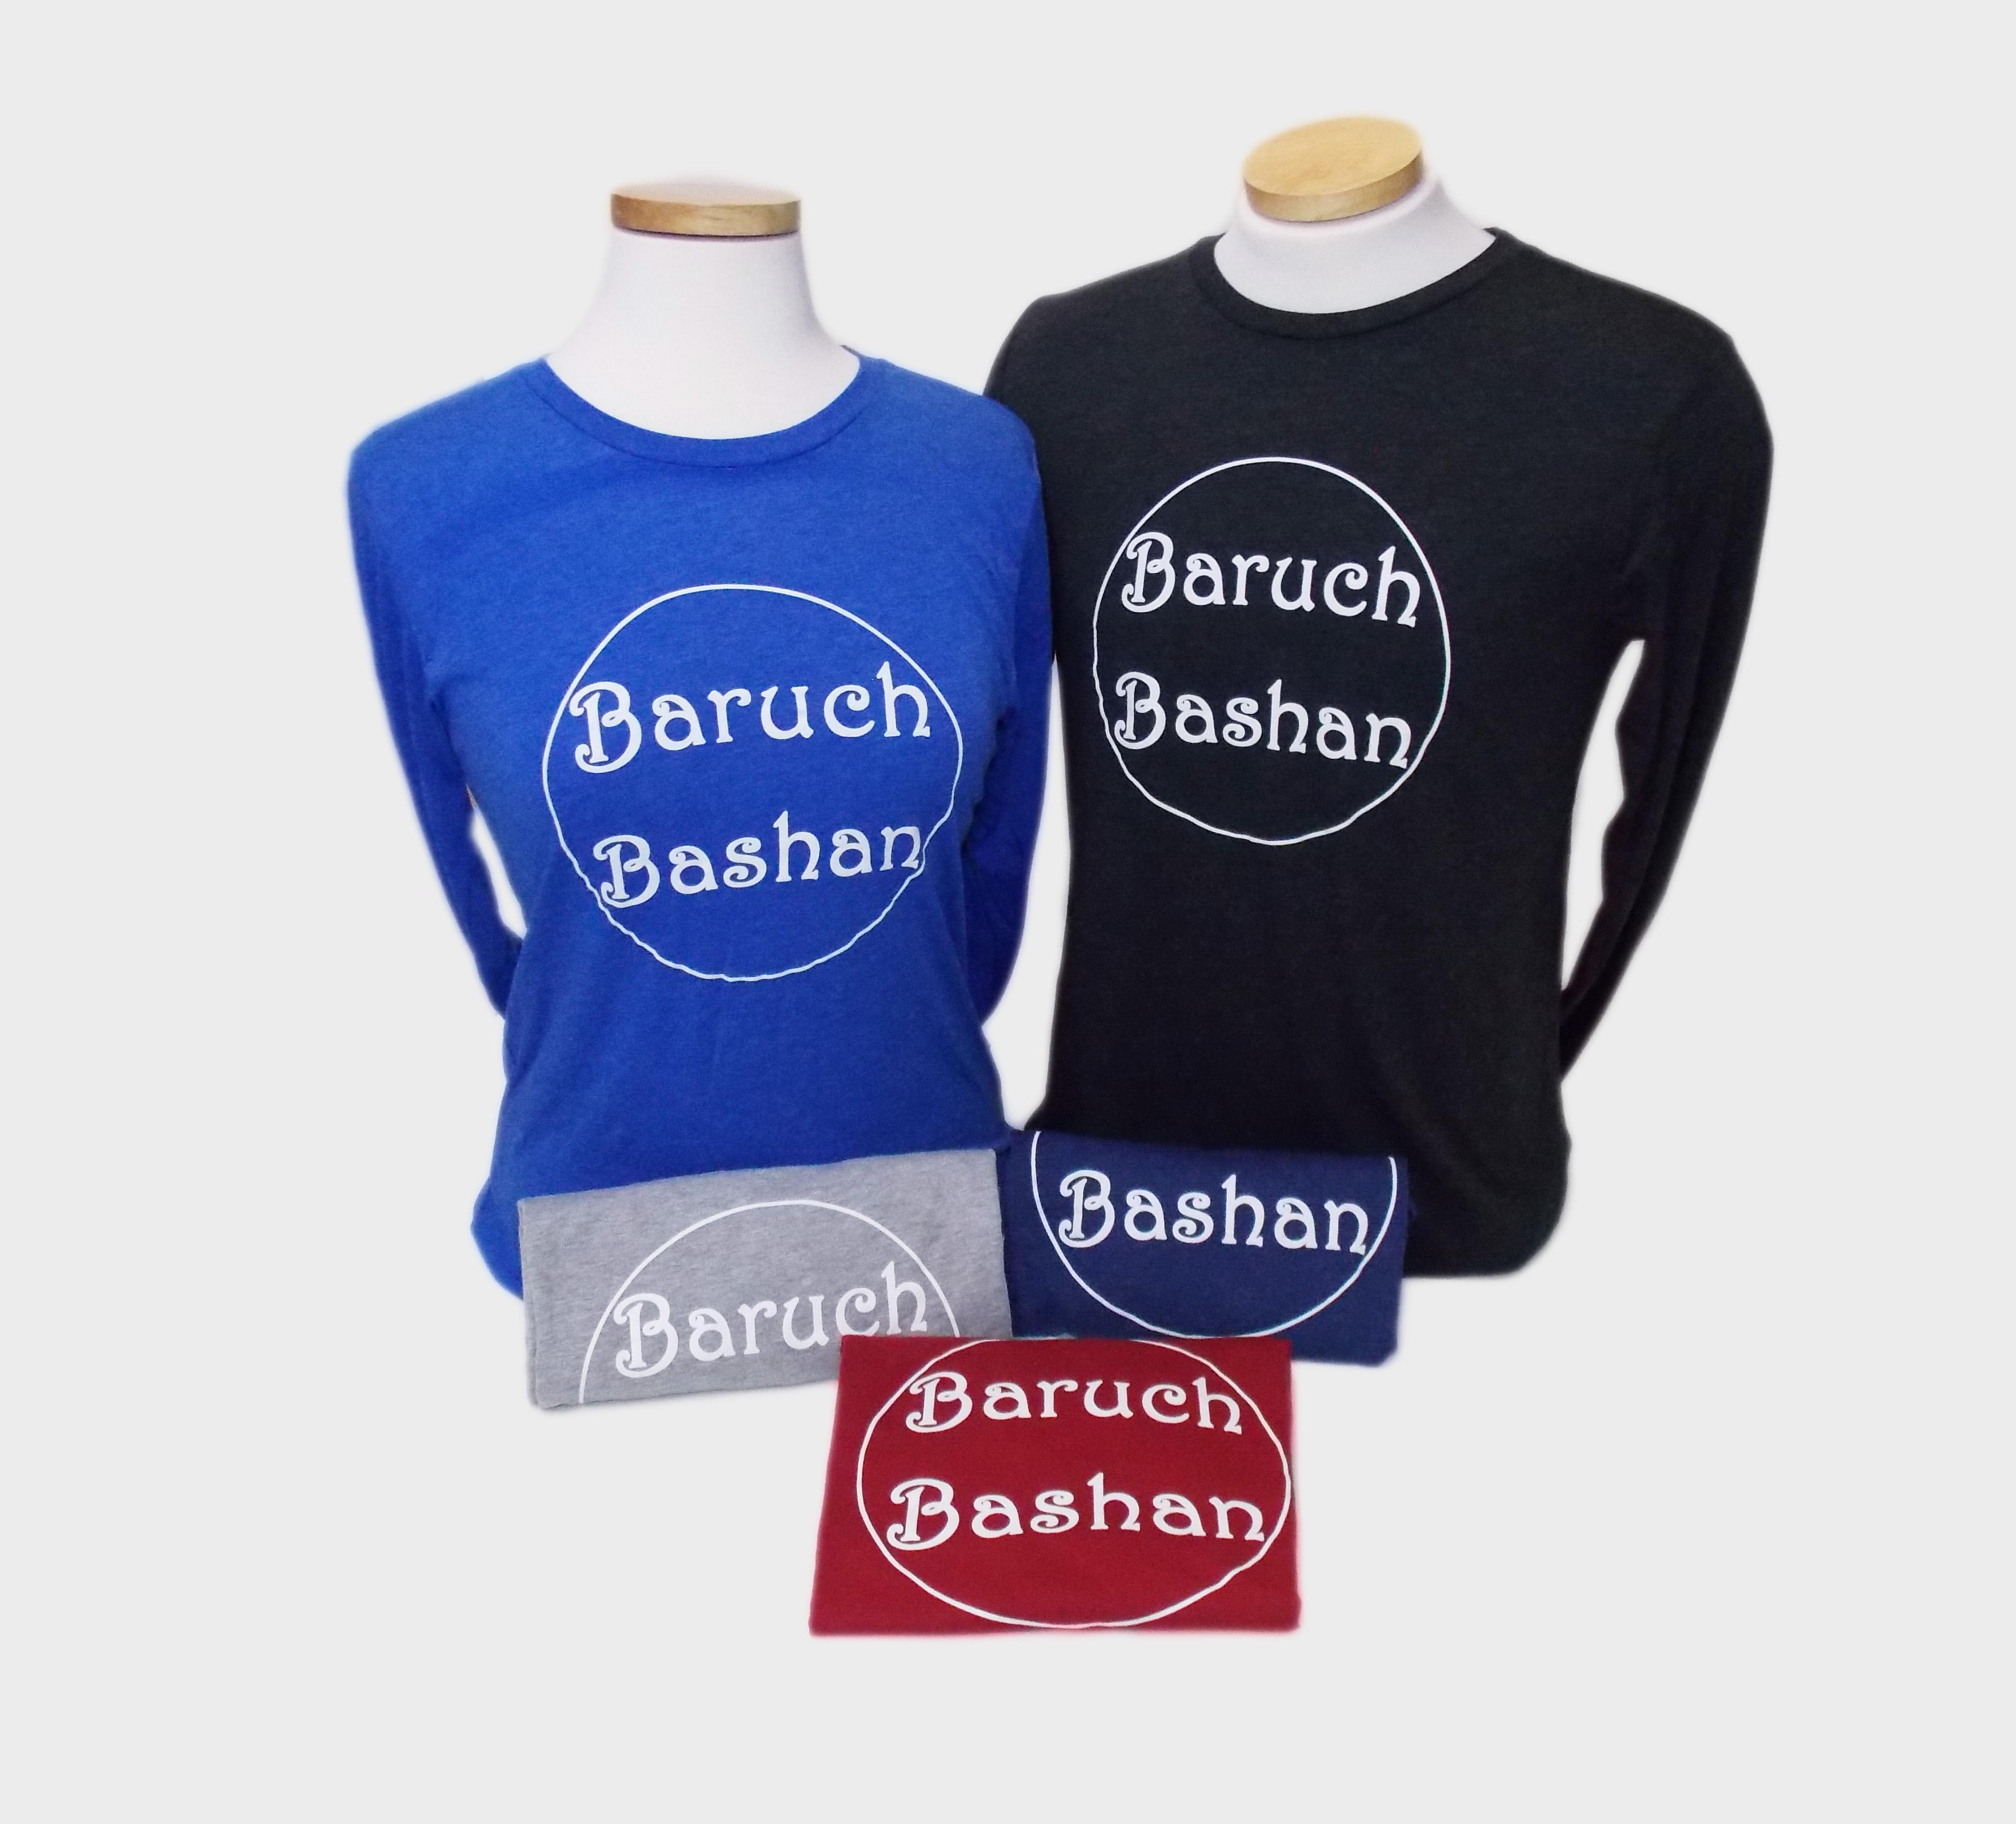 Baruch Bashan TShirt